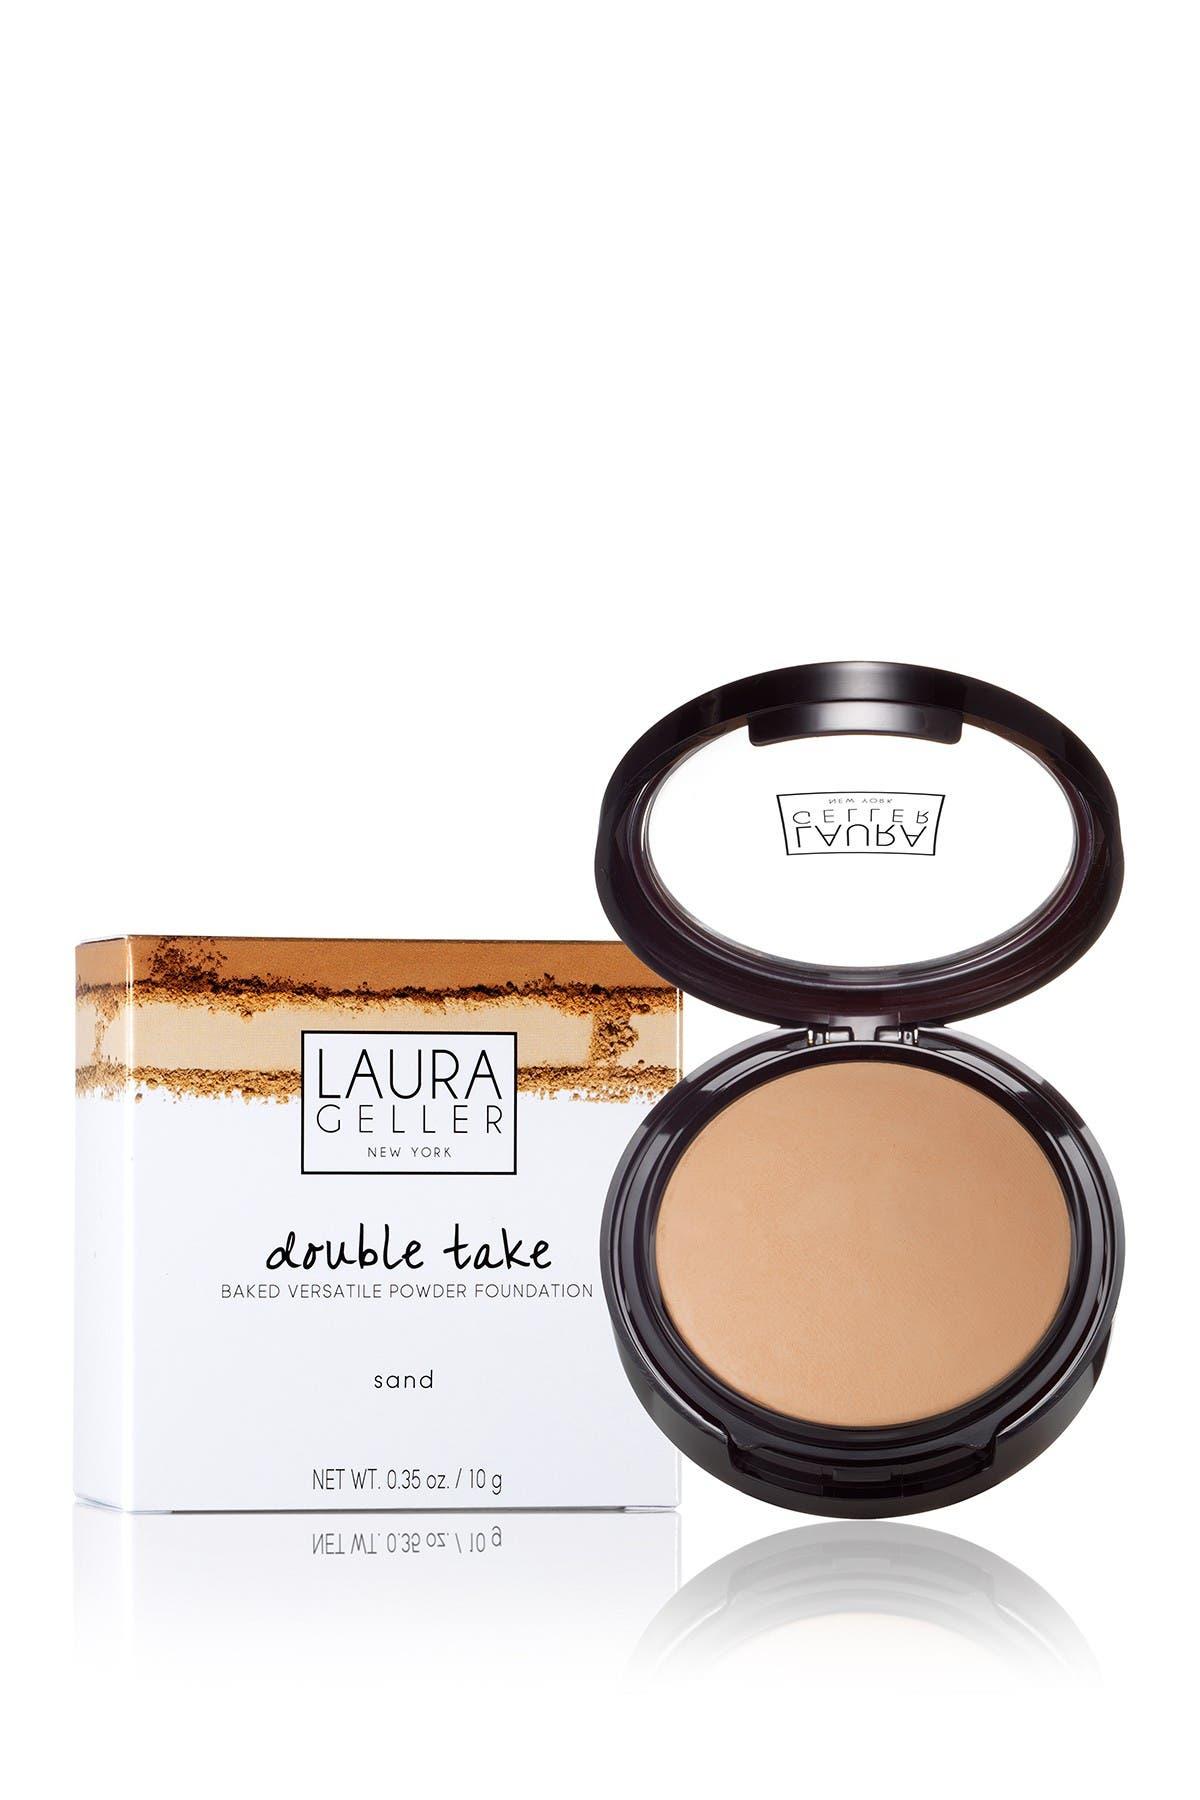 Image of Laura Geller New York Double Take Baked Versatile Powder Foundation - Sand